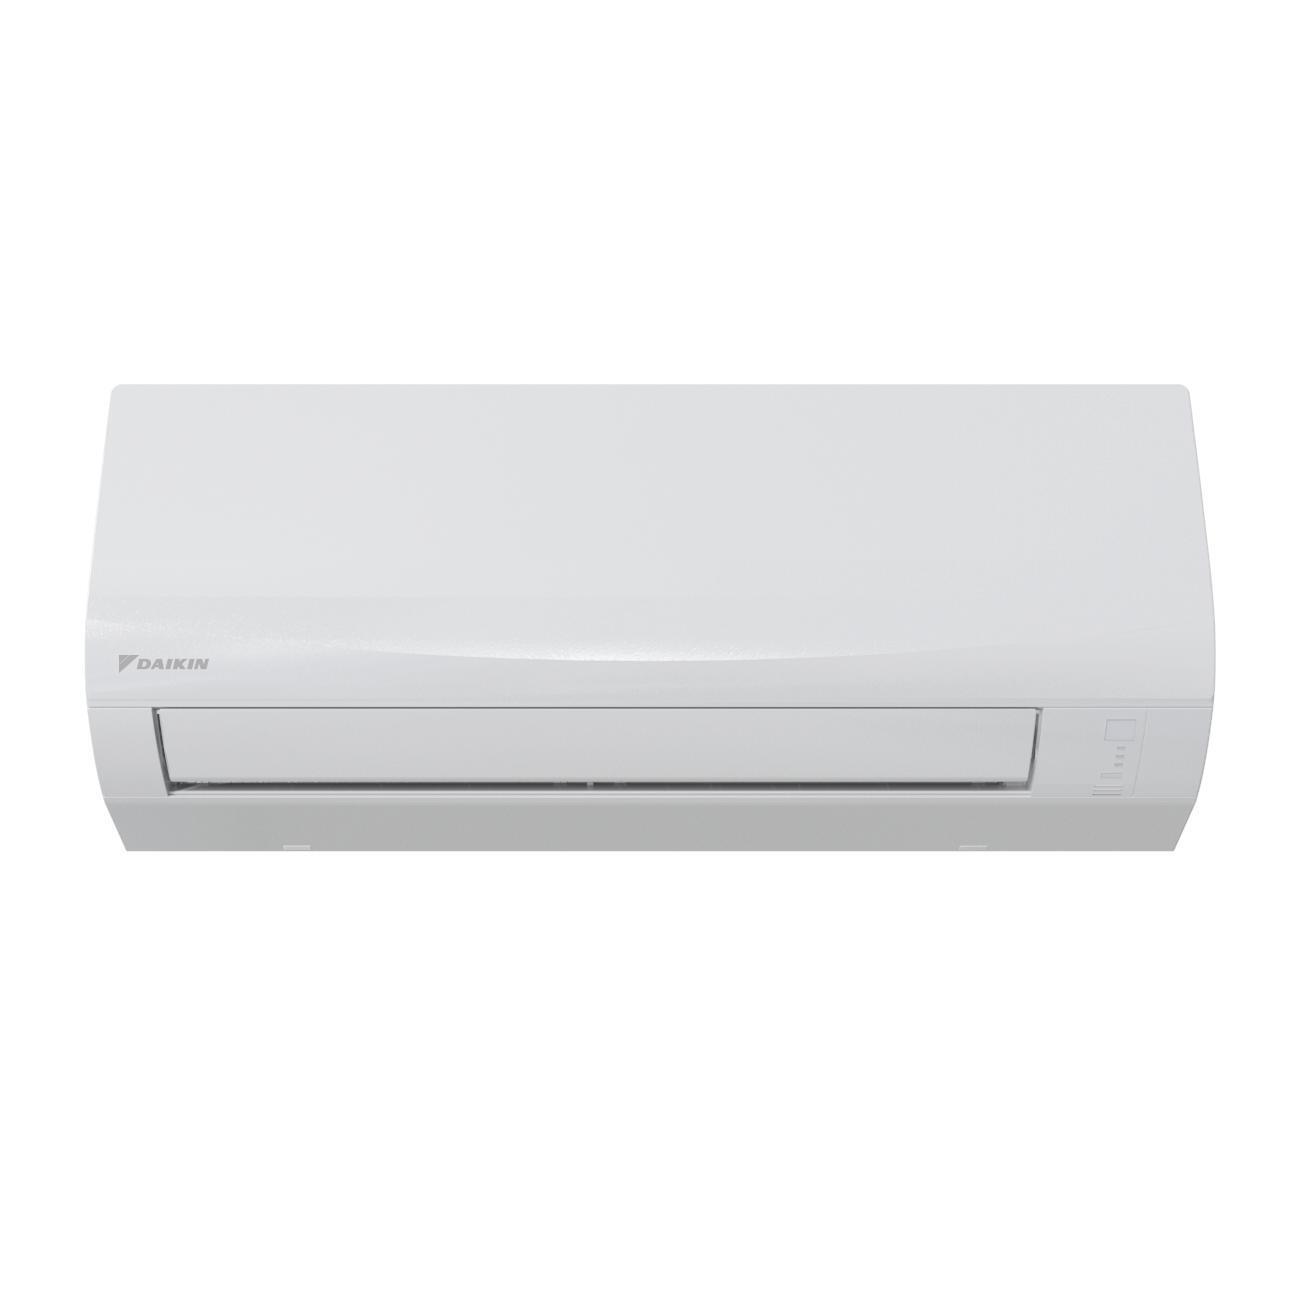 Climatizzatore dualsplit DAIKIN ATXF 17060 BTU - 3